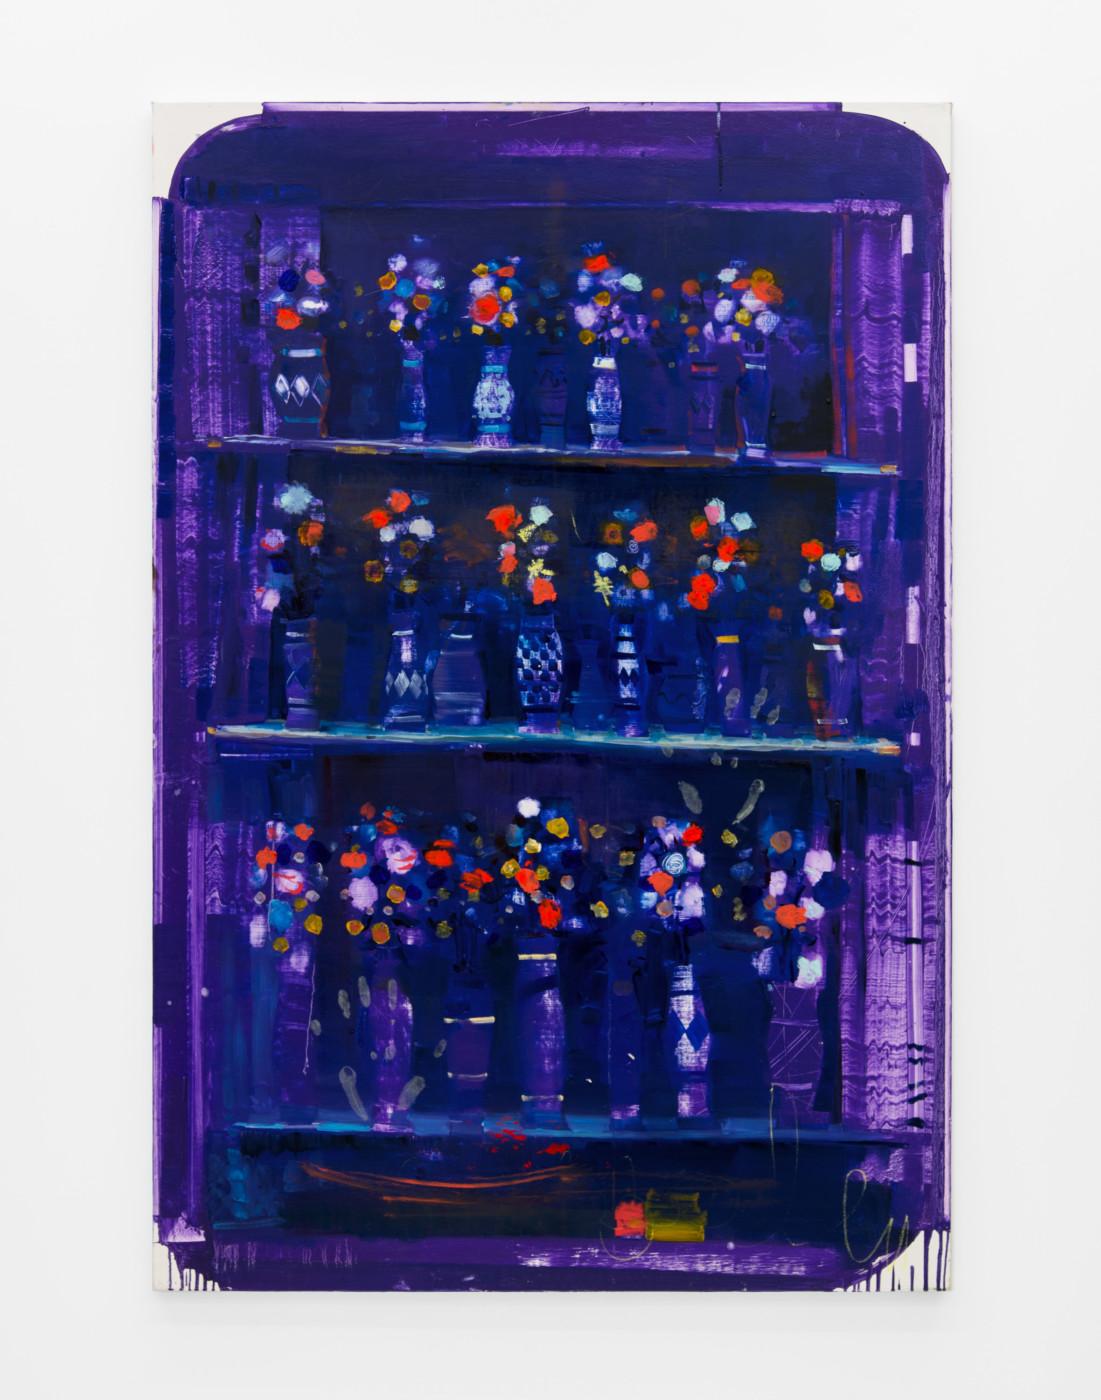 NATHAN ZEIDMAN  Provence Bluish Flowers #2 , 2018 Oil on canvas 152,4 × 101,6 cm / 60 × 40 in  - High Art Gallery Paris